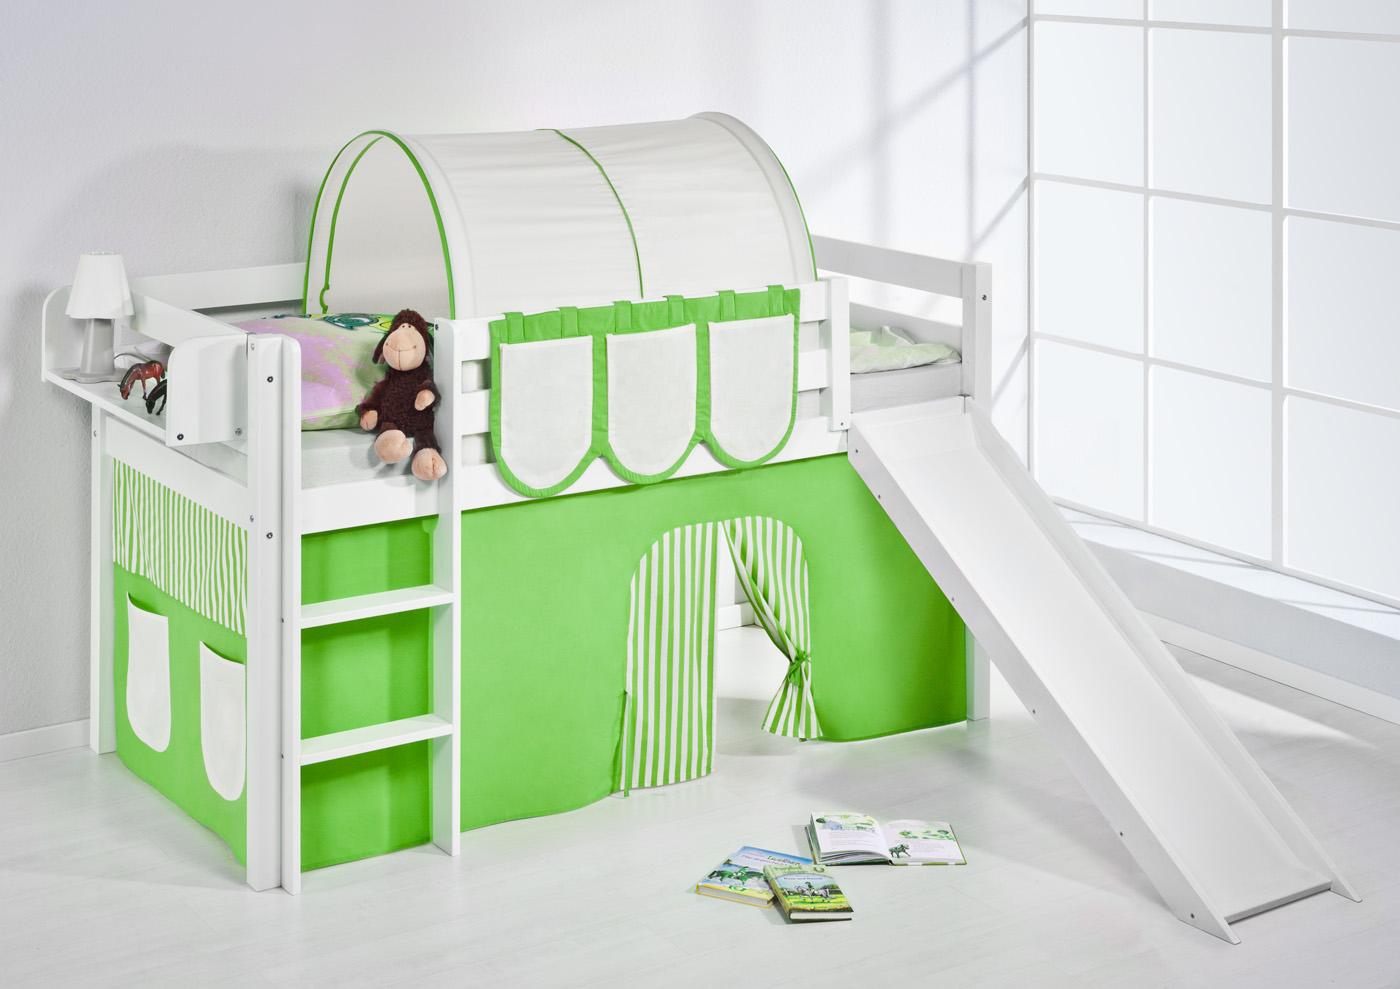 spielbett hochbett kinderbett kinder bett jelle mit rutsche vorhang ebay. Black Bedroom Furniture Sets. Home Design Ideas